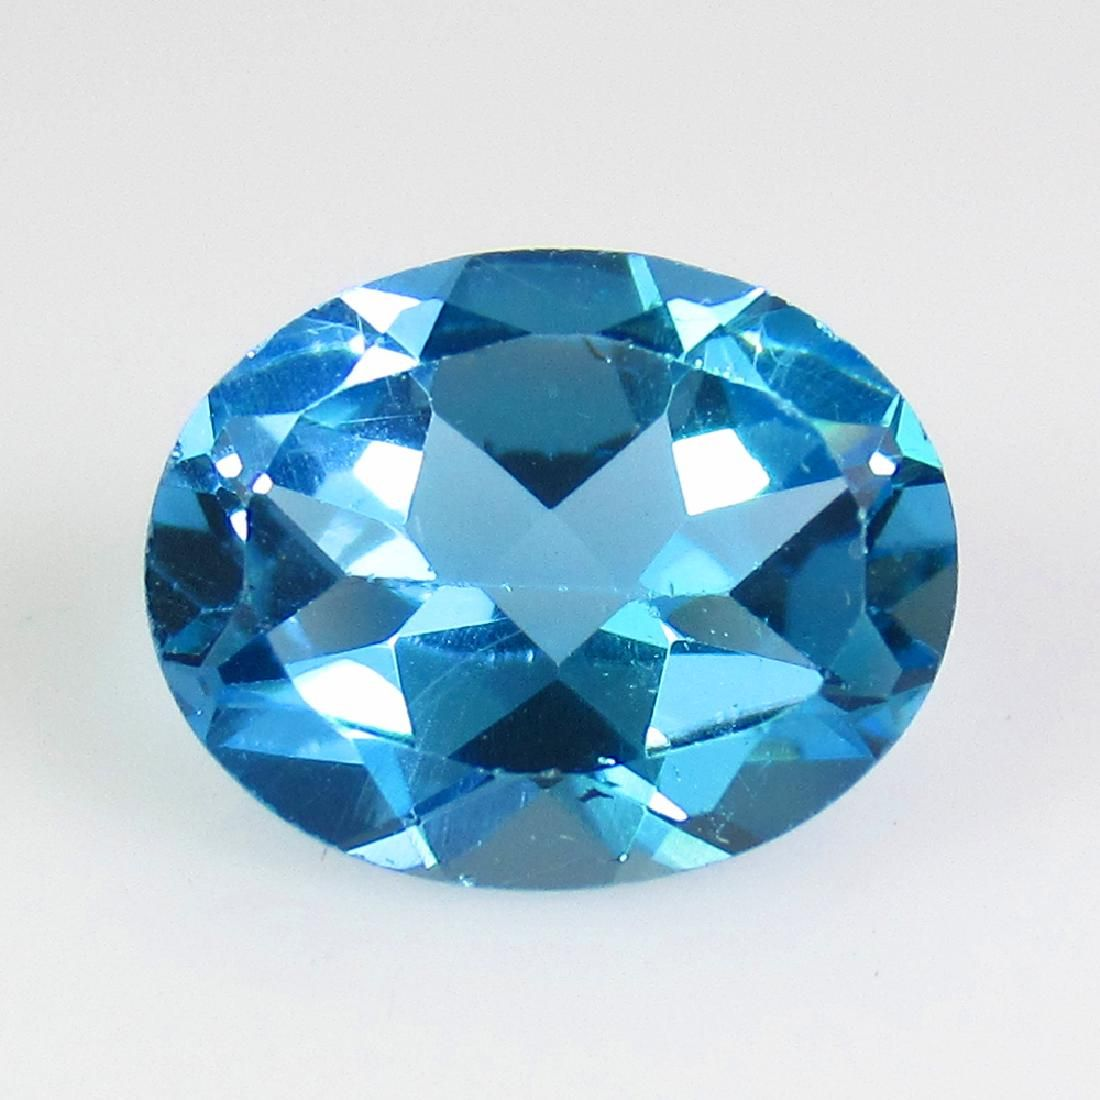 3.15 Ct Genuine Swiss Blue Topaz 10X8 mm Oval Cut